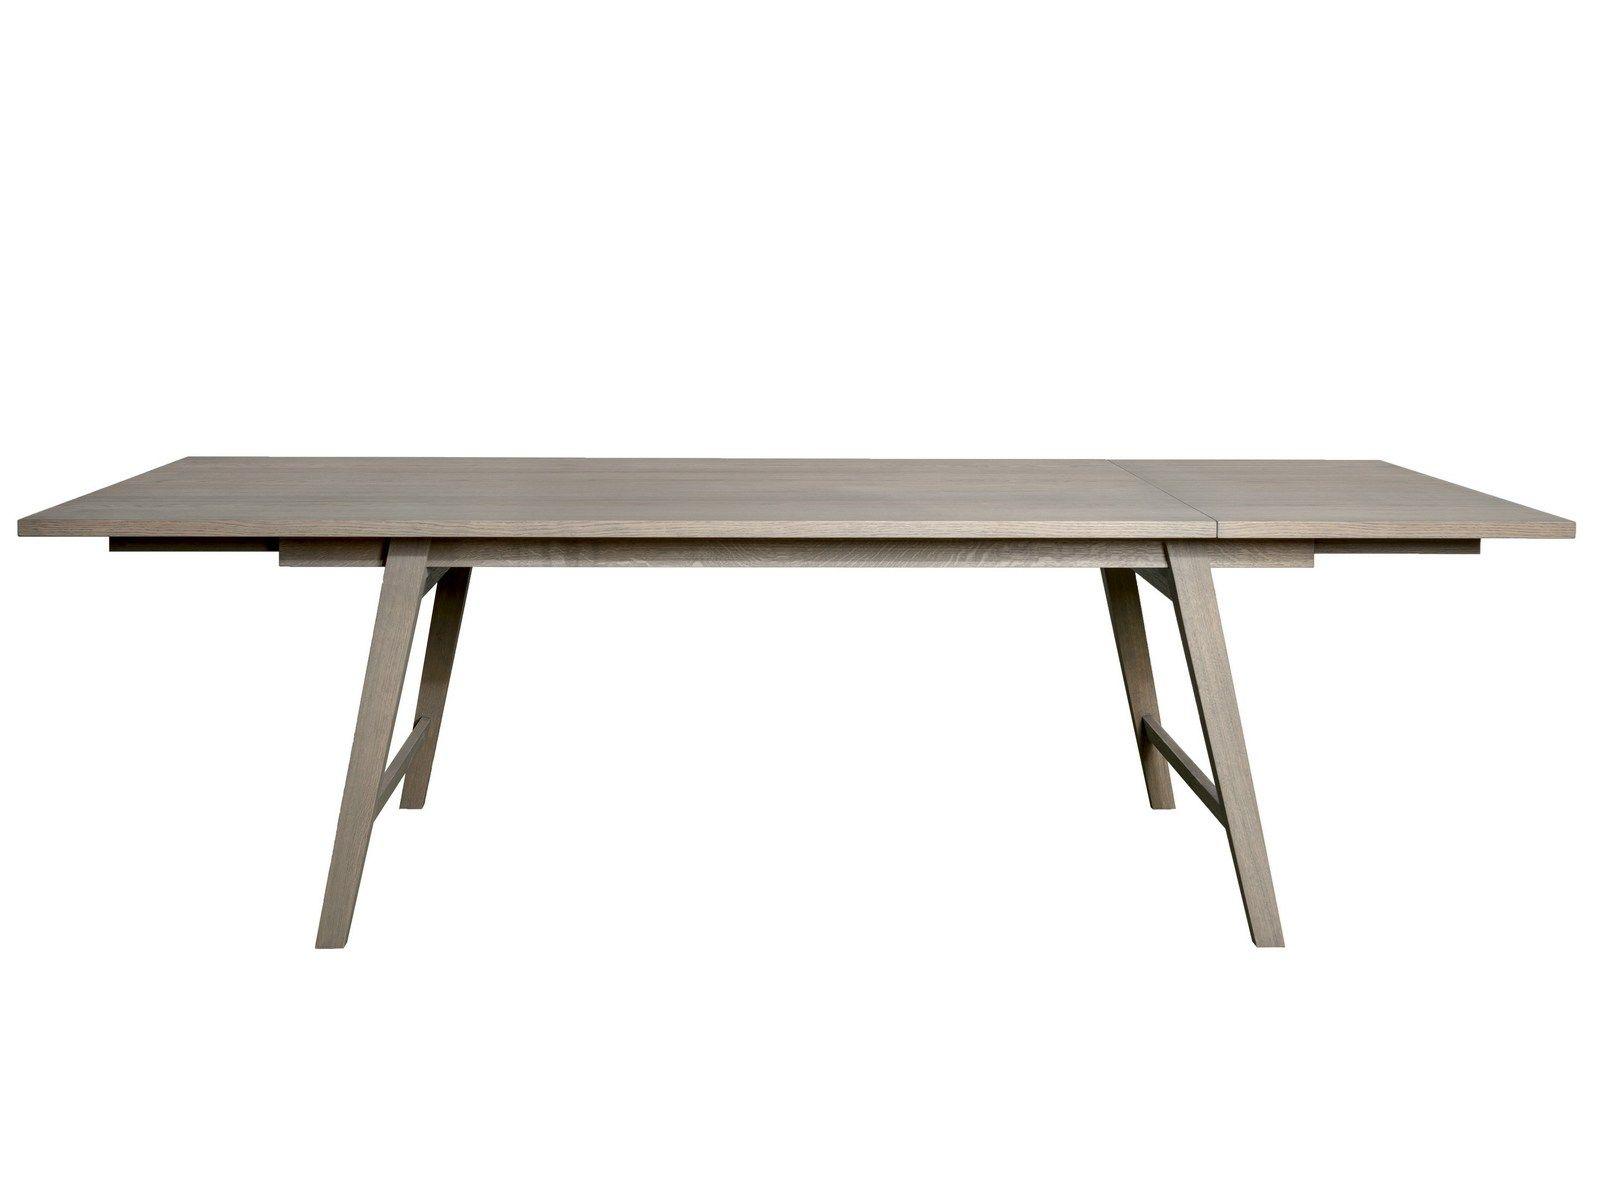 zwo 60 tavolo allungabile by kff. Black Bedroom Furniture Sets. Home Design Ideas